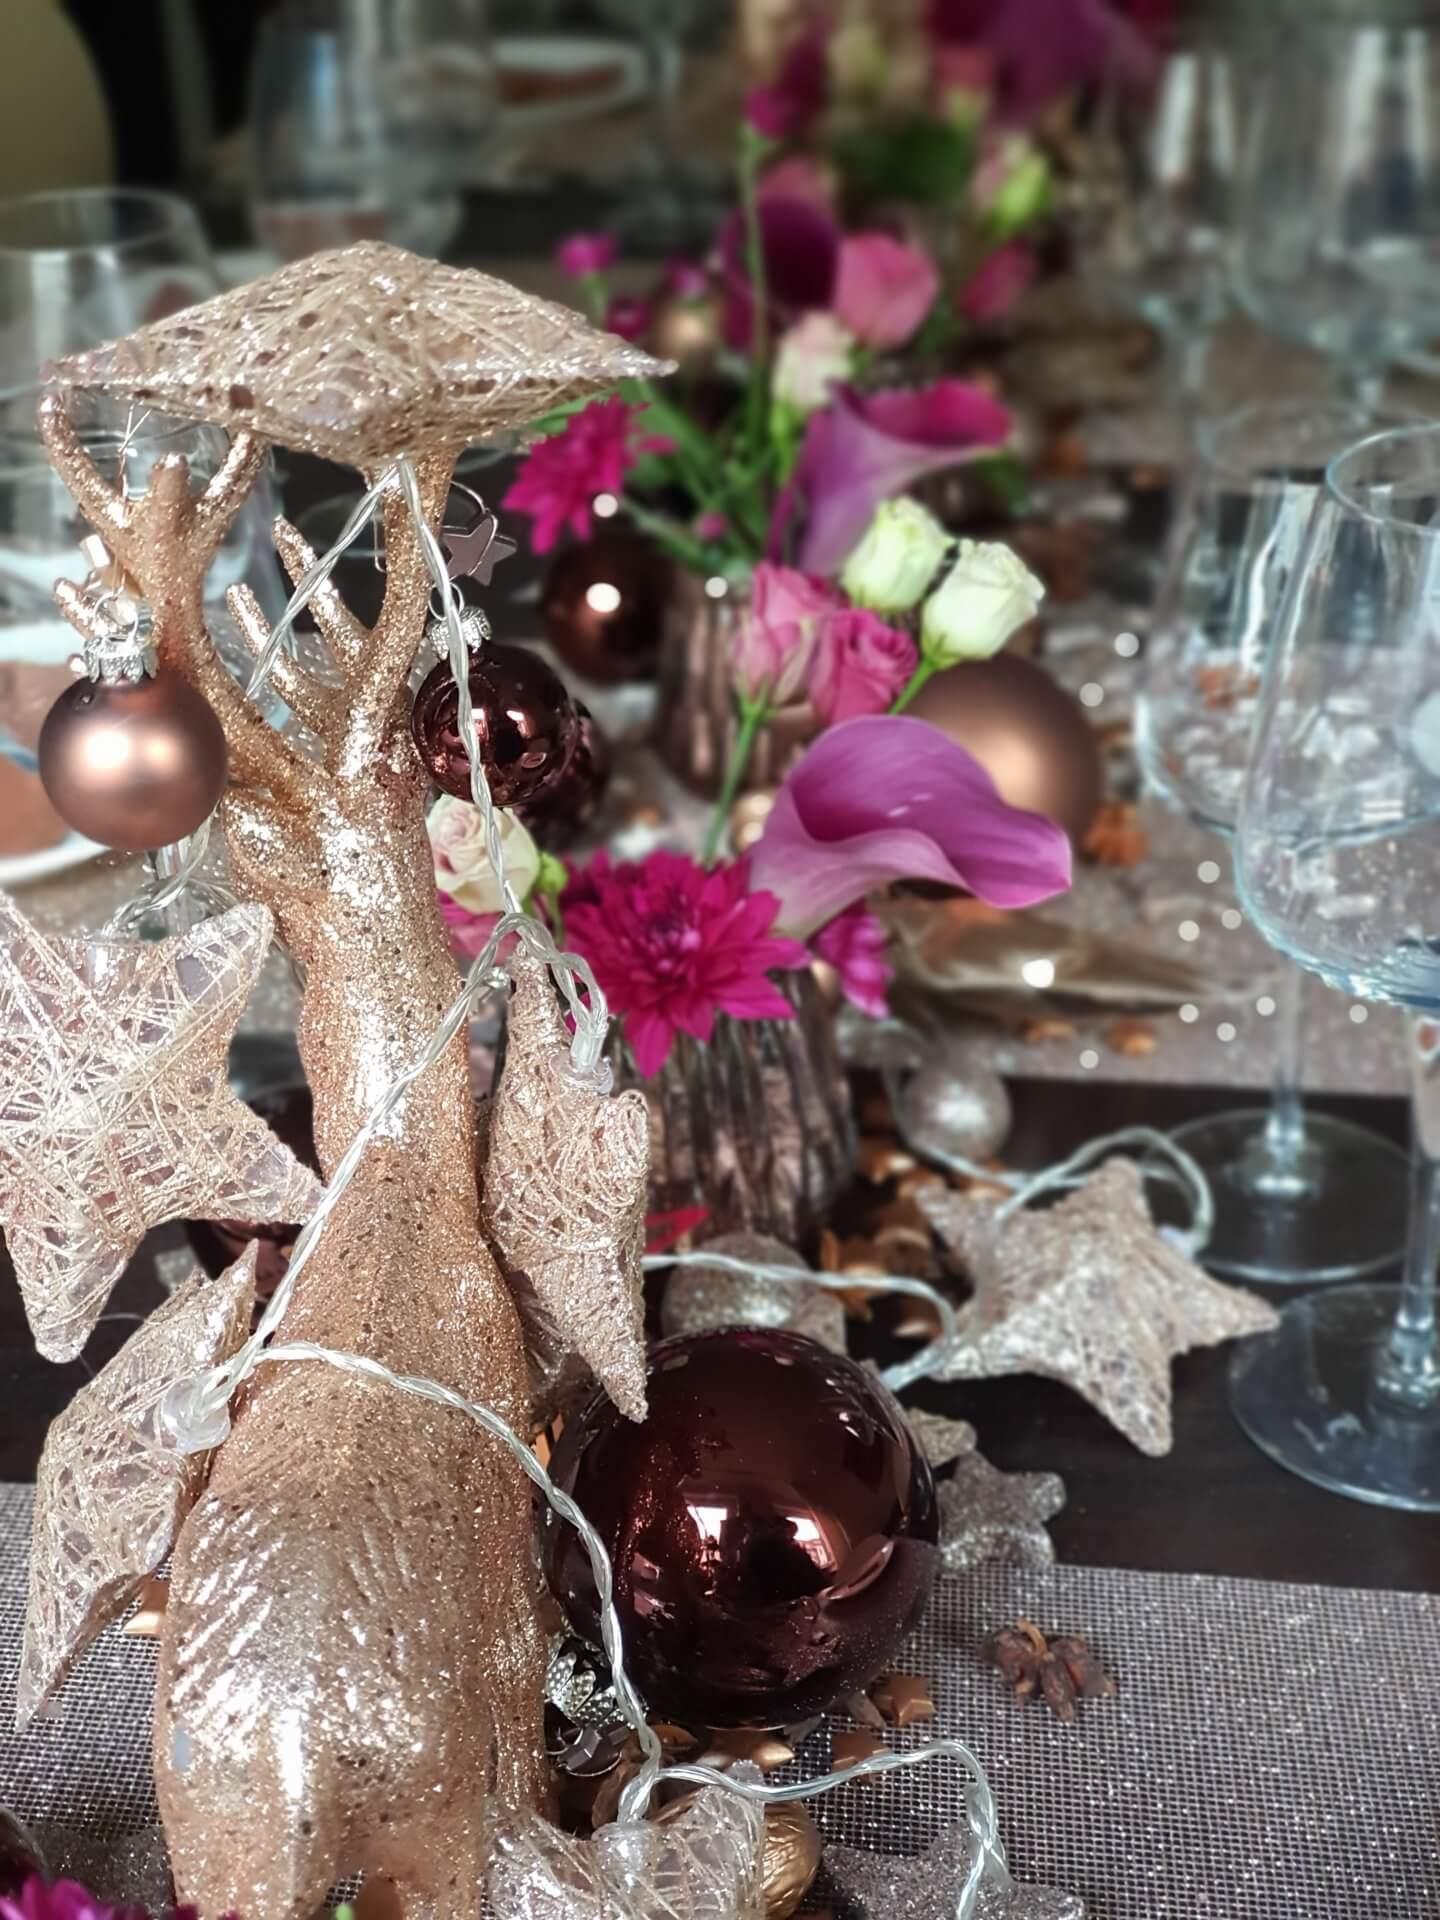 Rosegoldene Weihnachtstafel